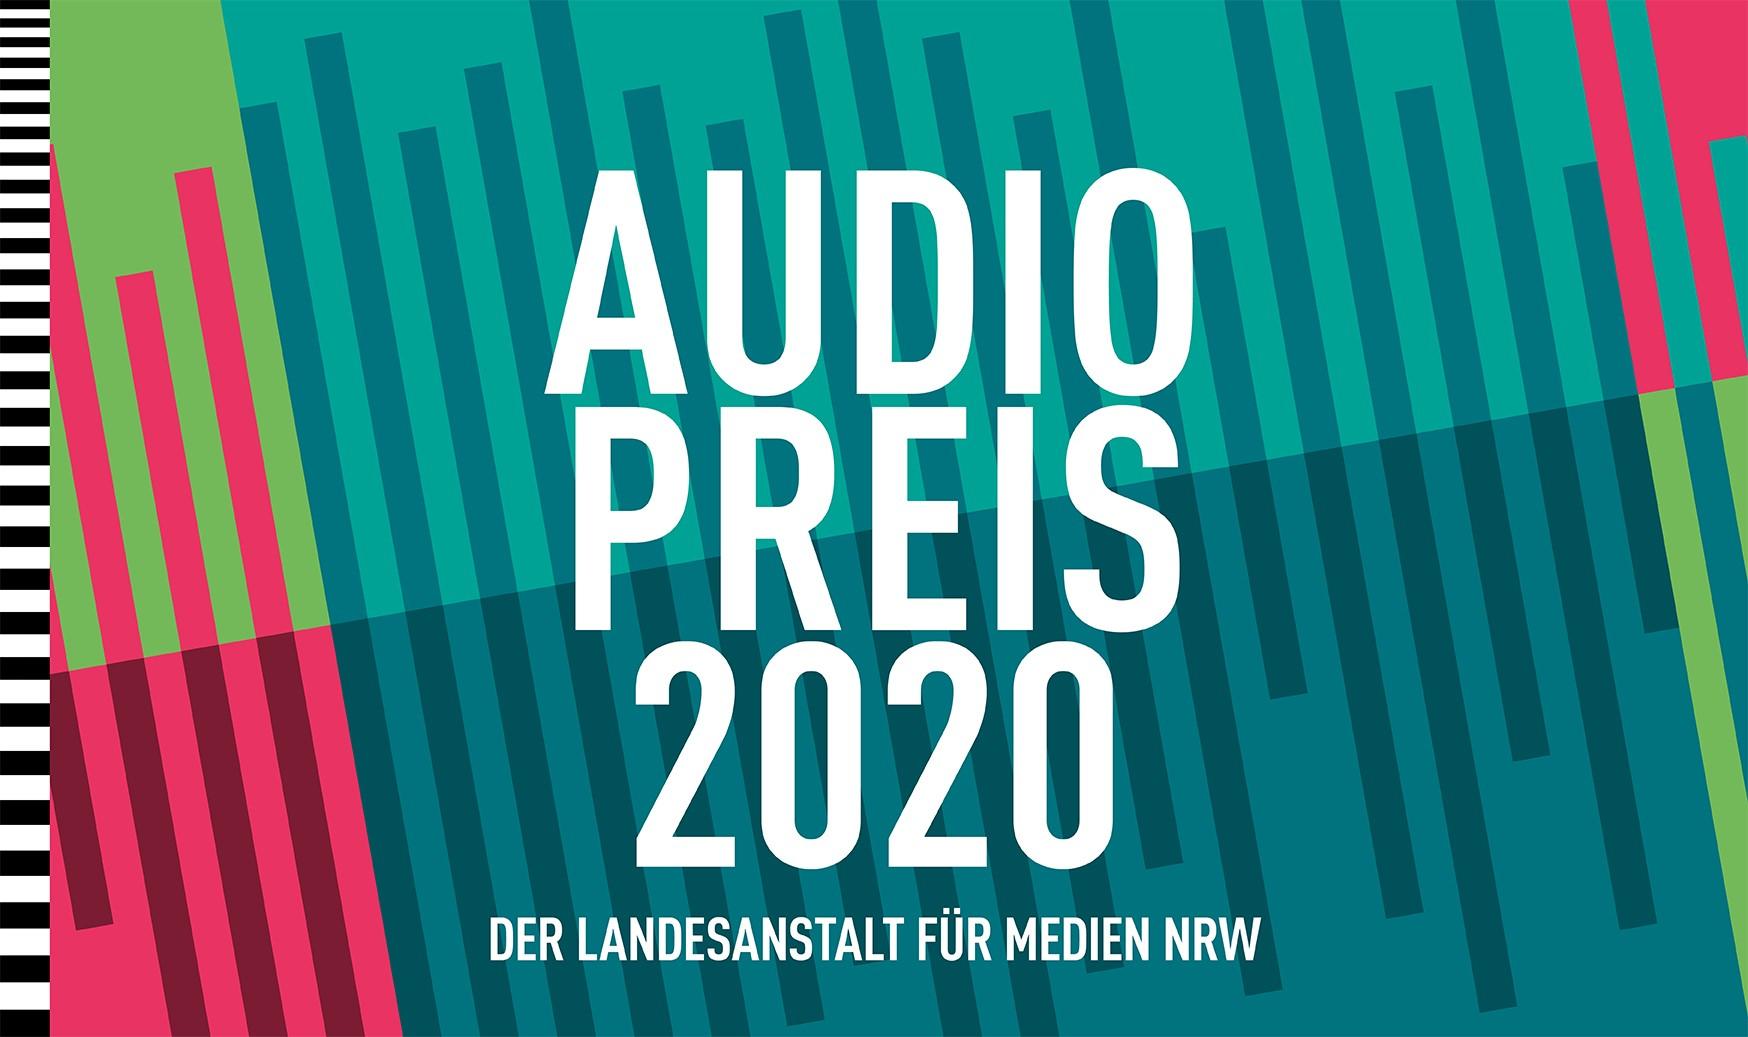 Audiopreis 2020 - Jetzt bewerben!